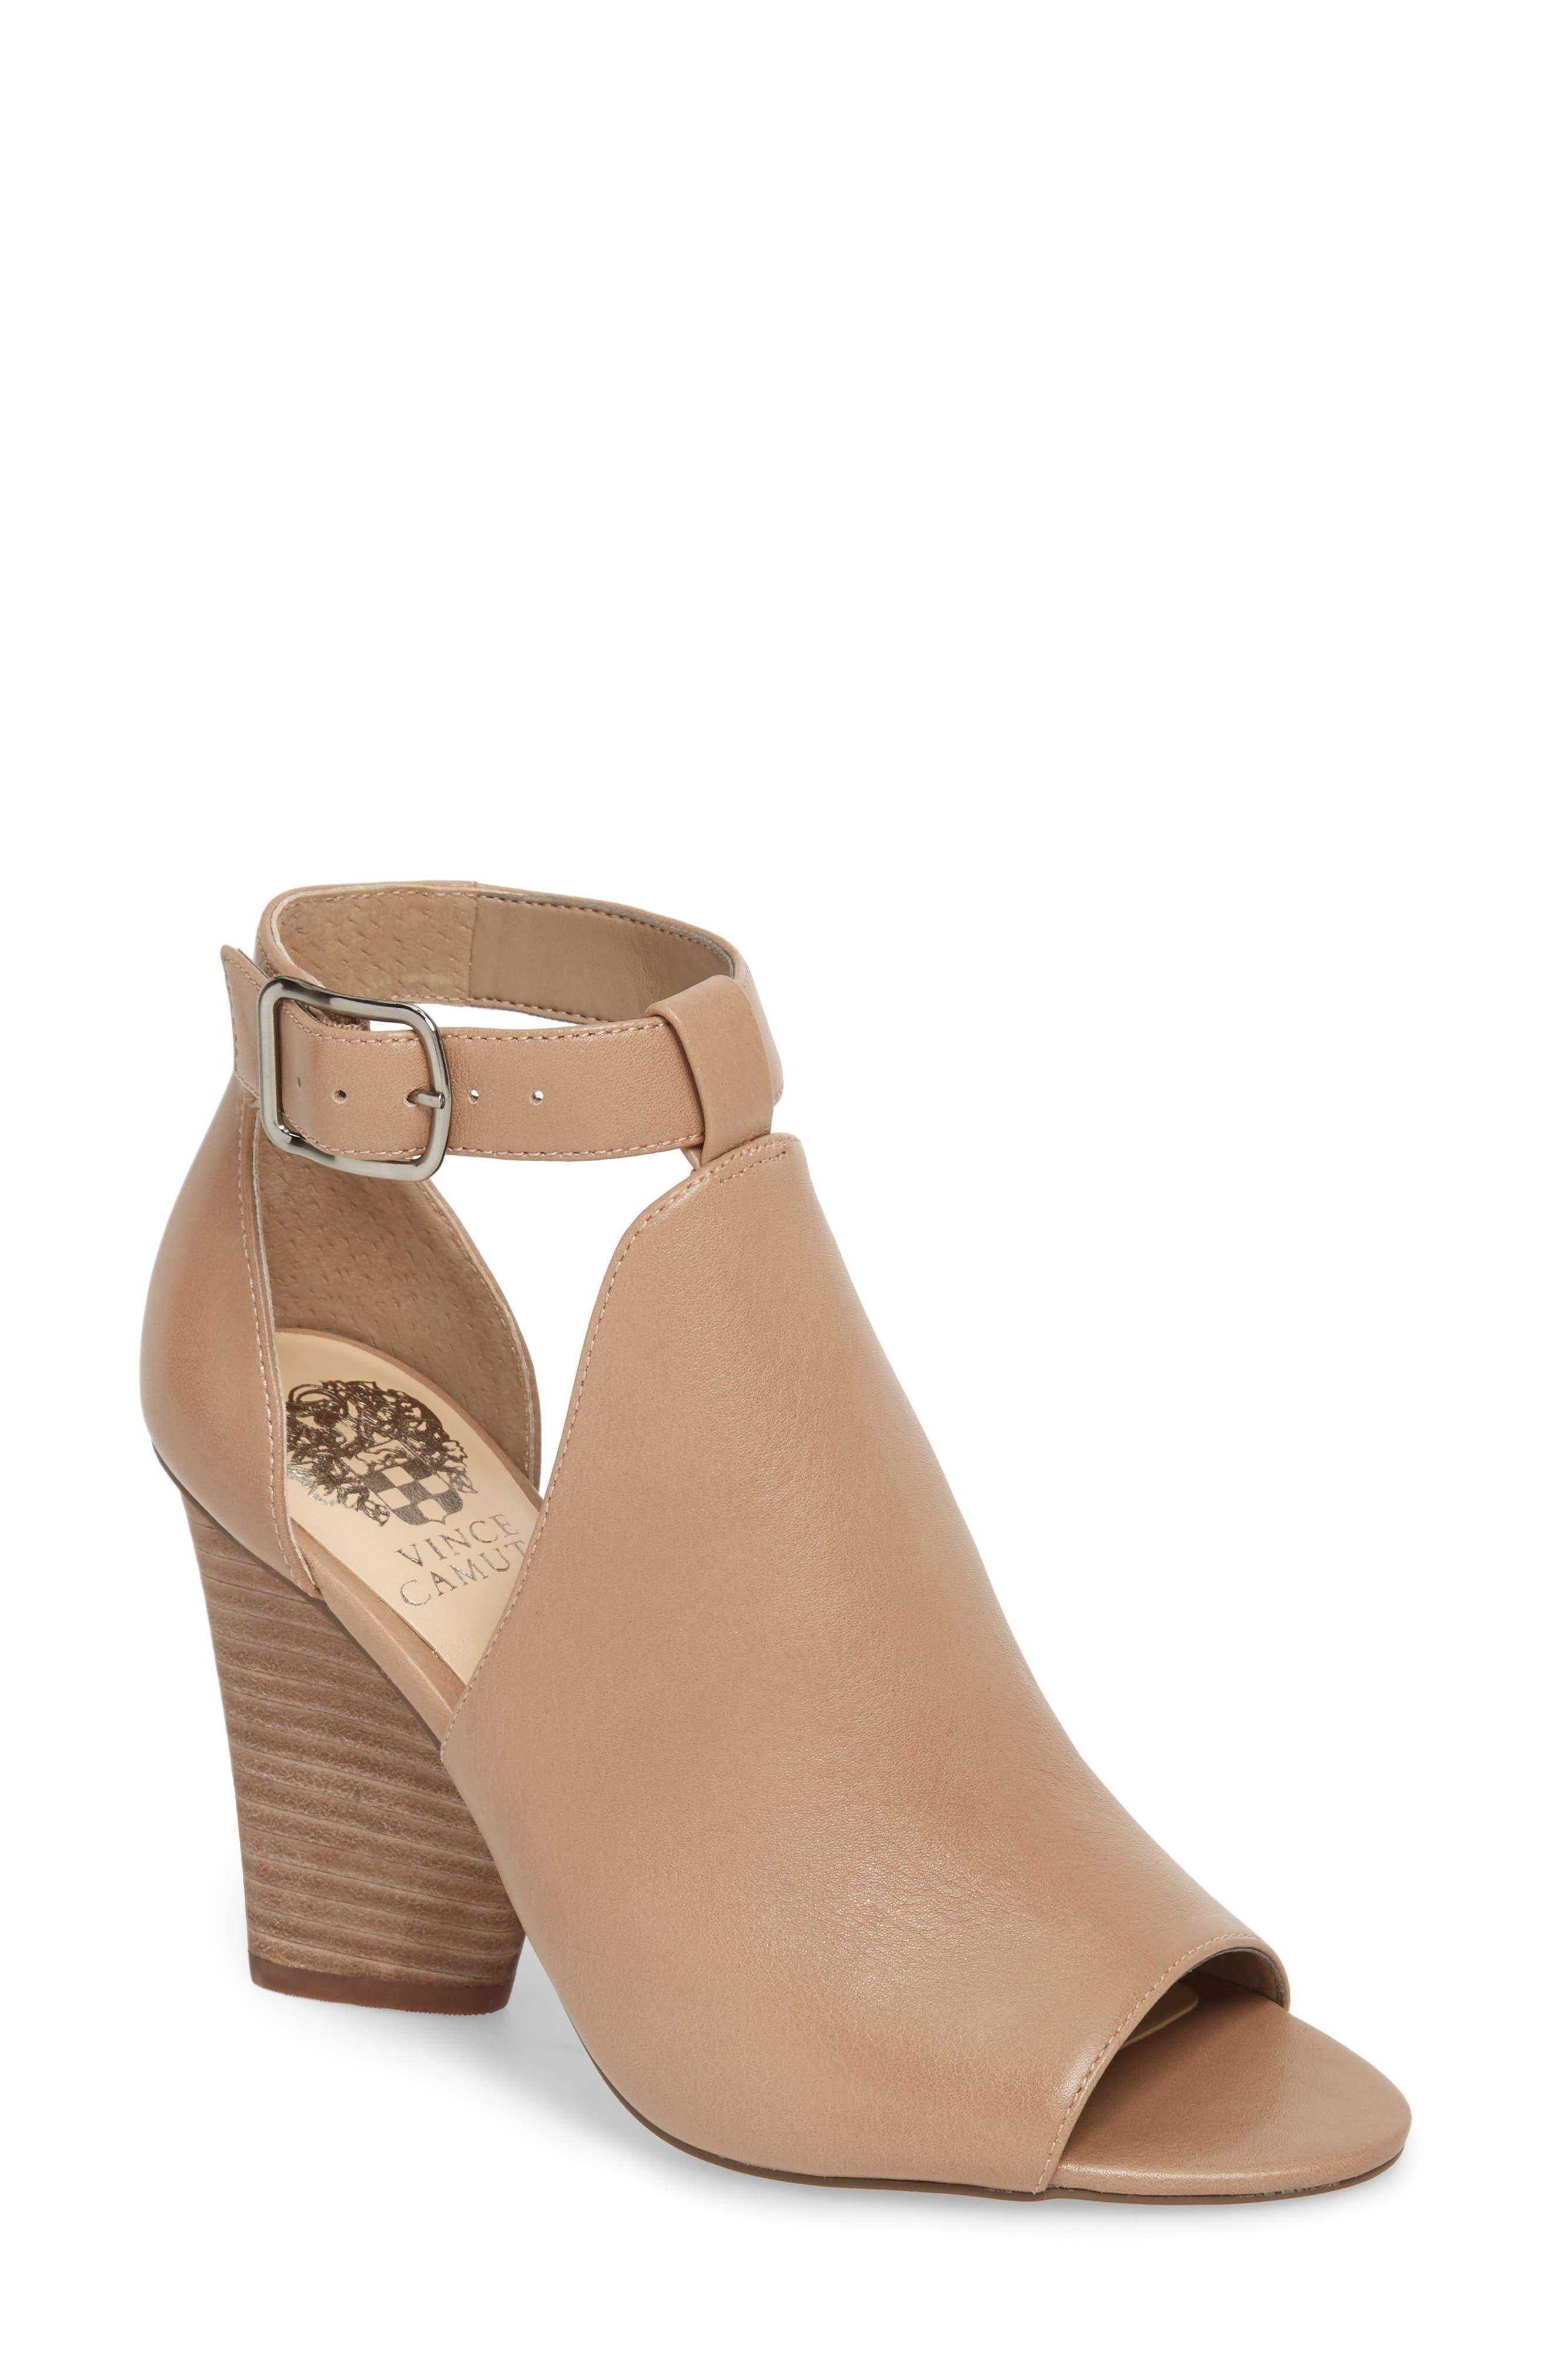 Adaren Peep Toe Sandal,                         Main,                         color, Dusty Trail Leather